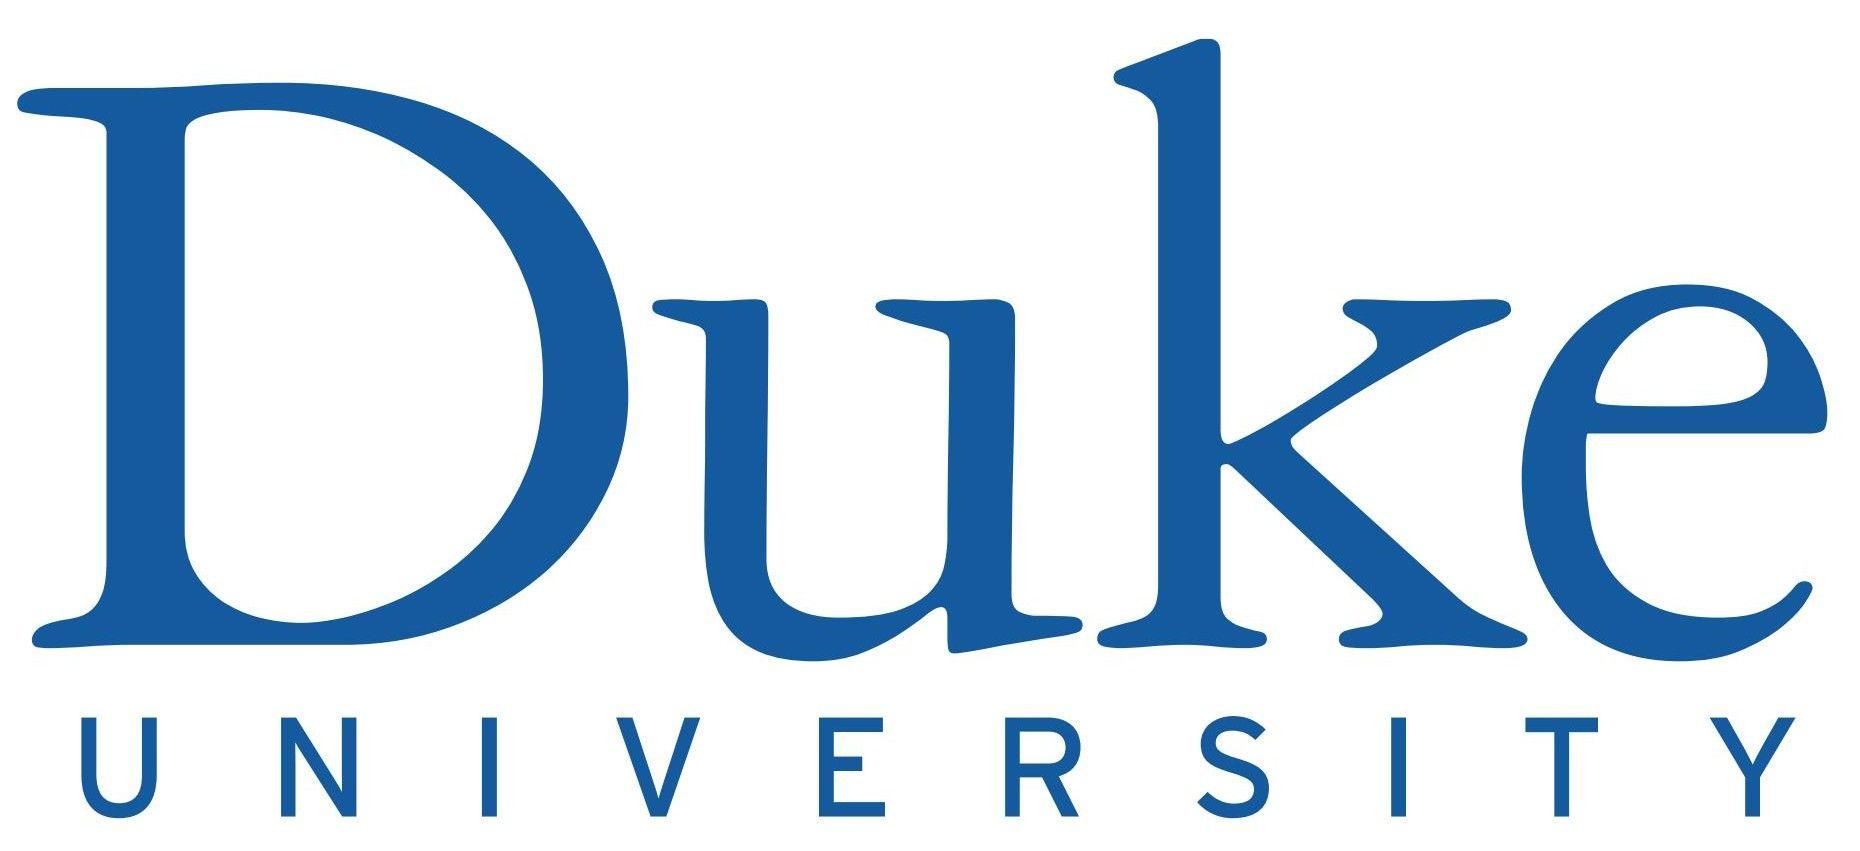 Duke University Logo and Crest World Universities Logos